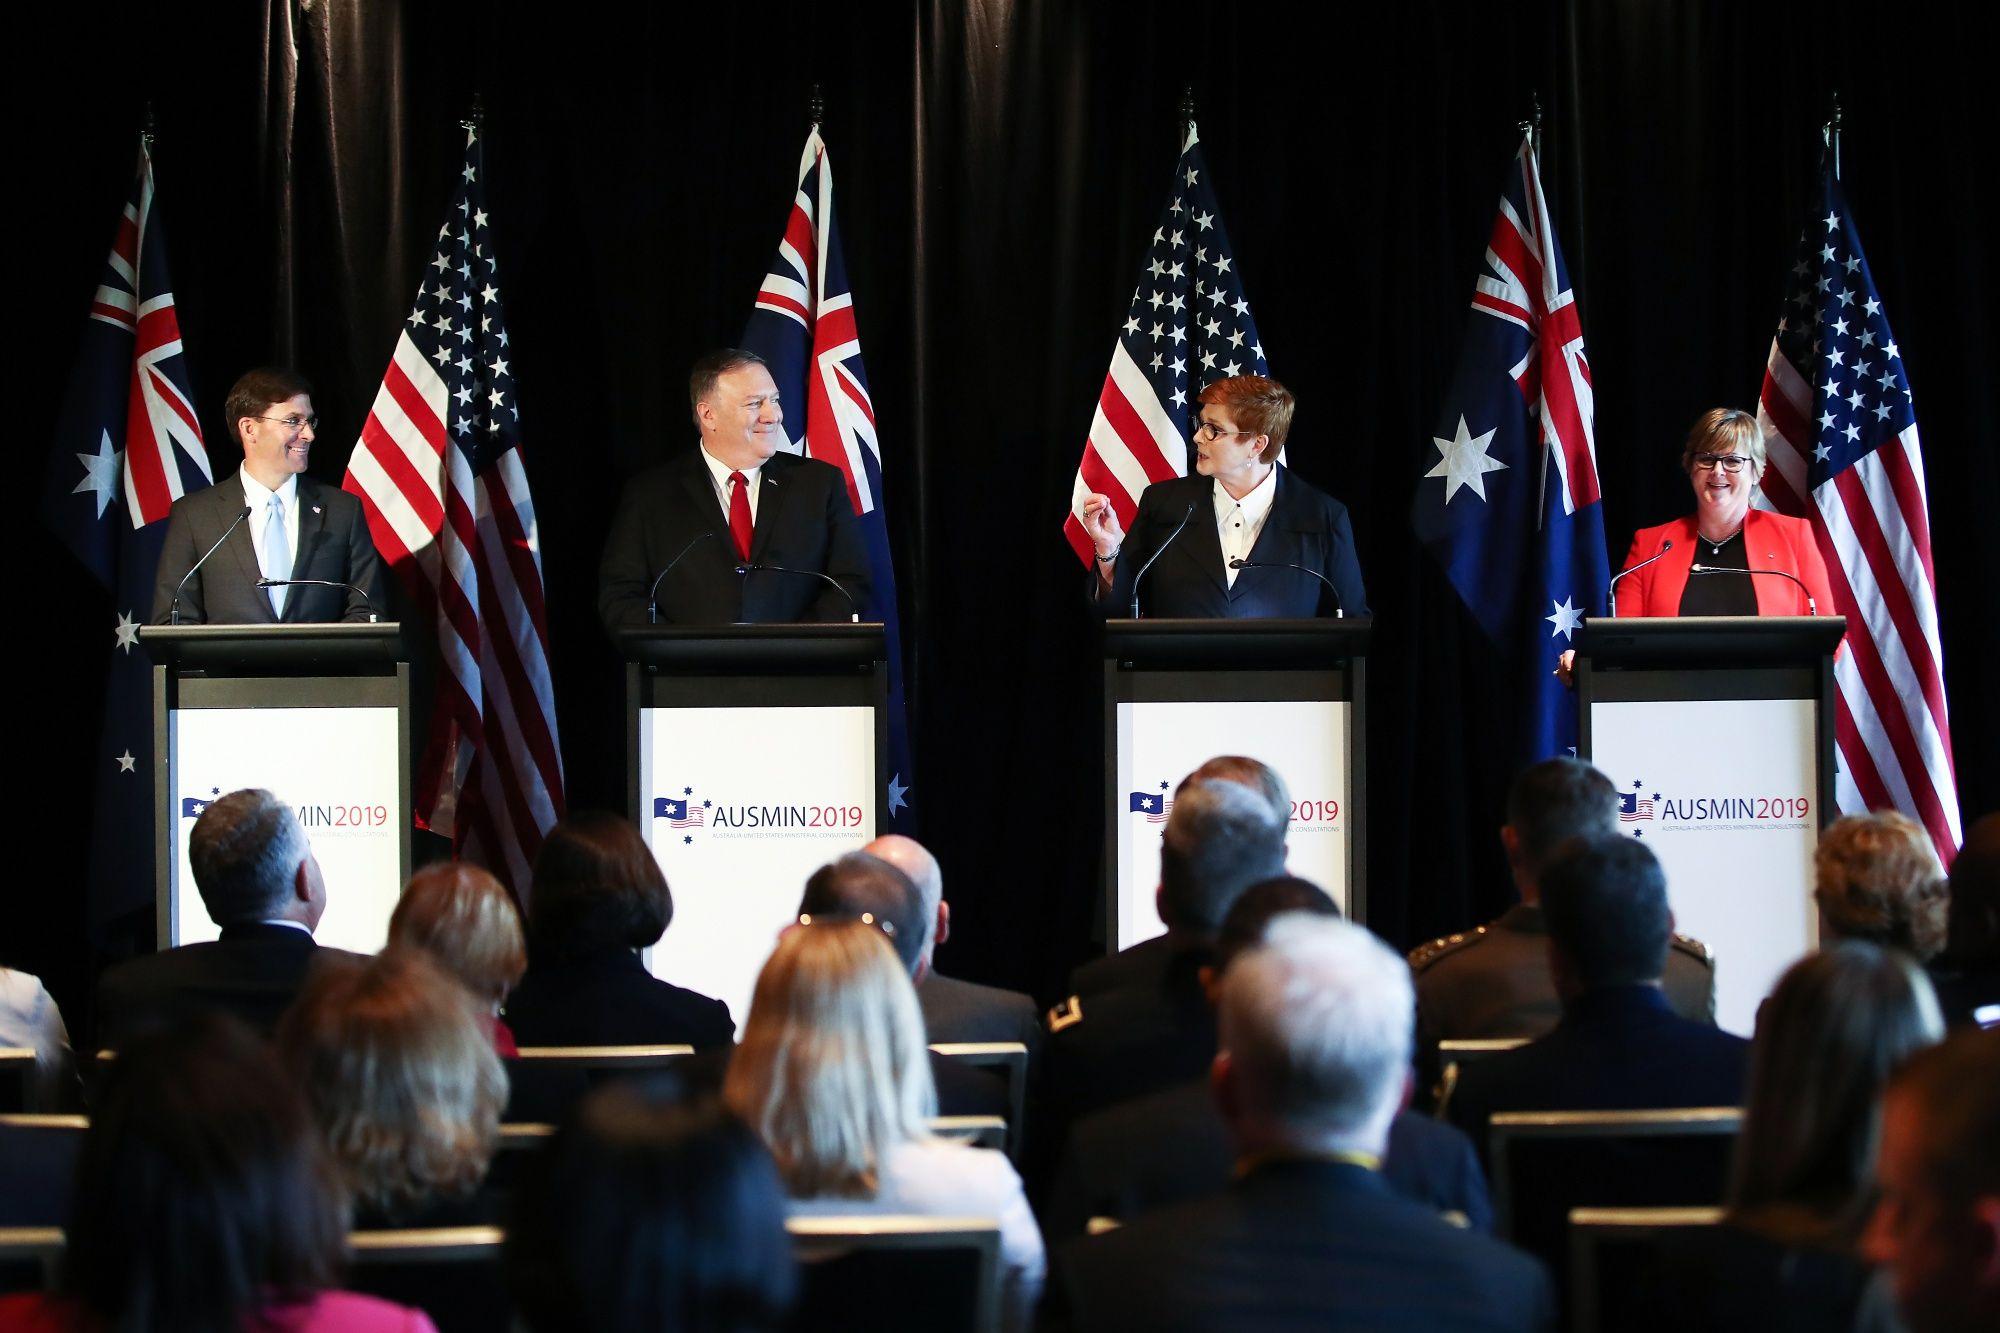 Australia Won't Consider Hosting U.S. Missiles, PM Morrison Says